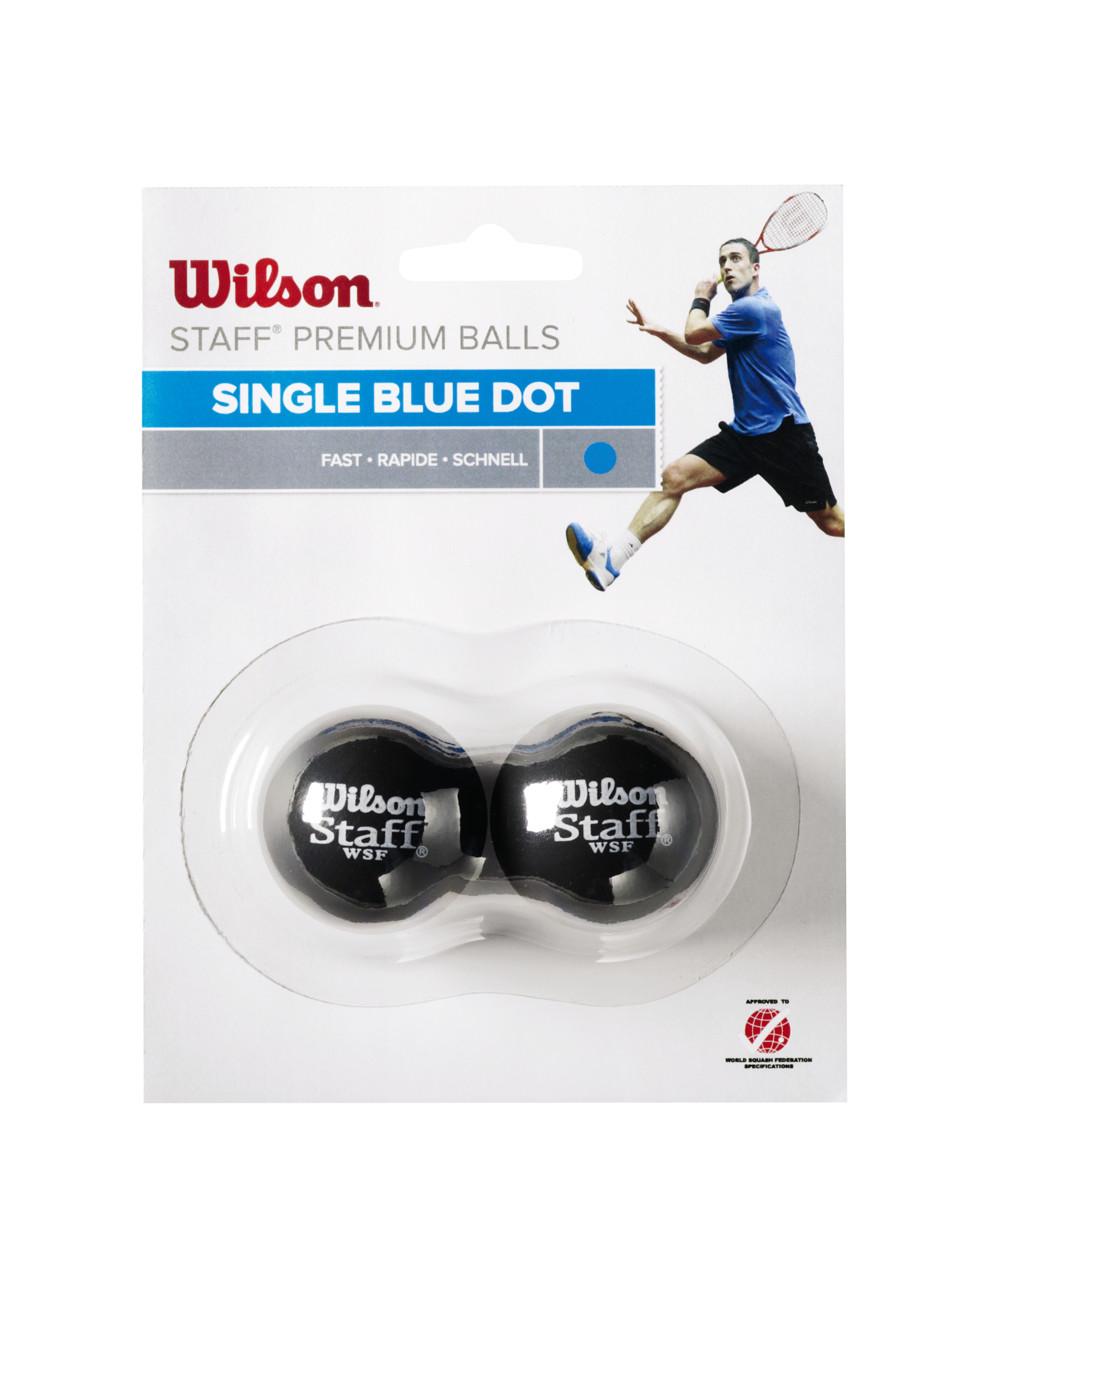 WILSON STAFF SQUASH 2 BALL BL DOT